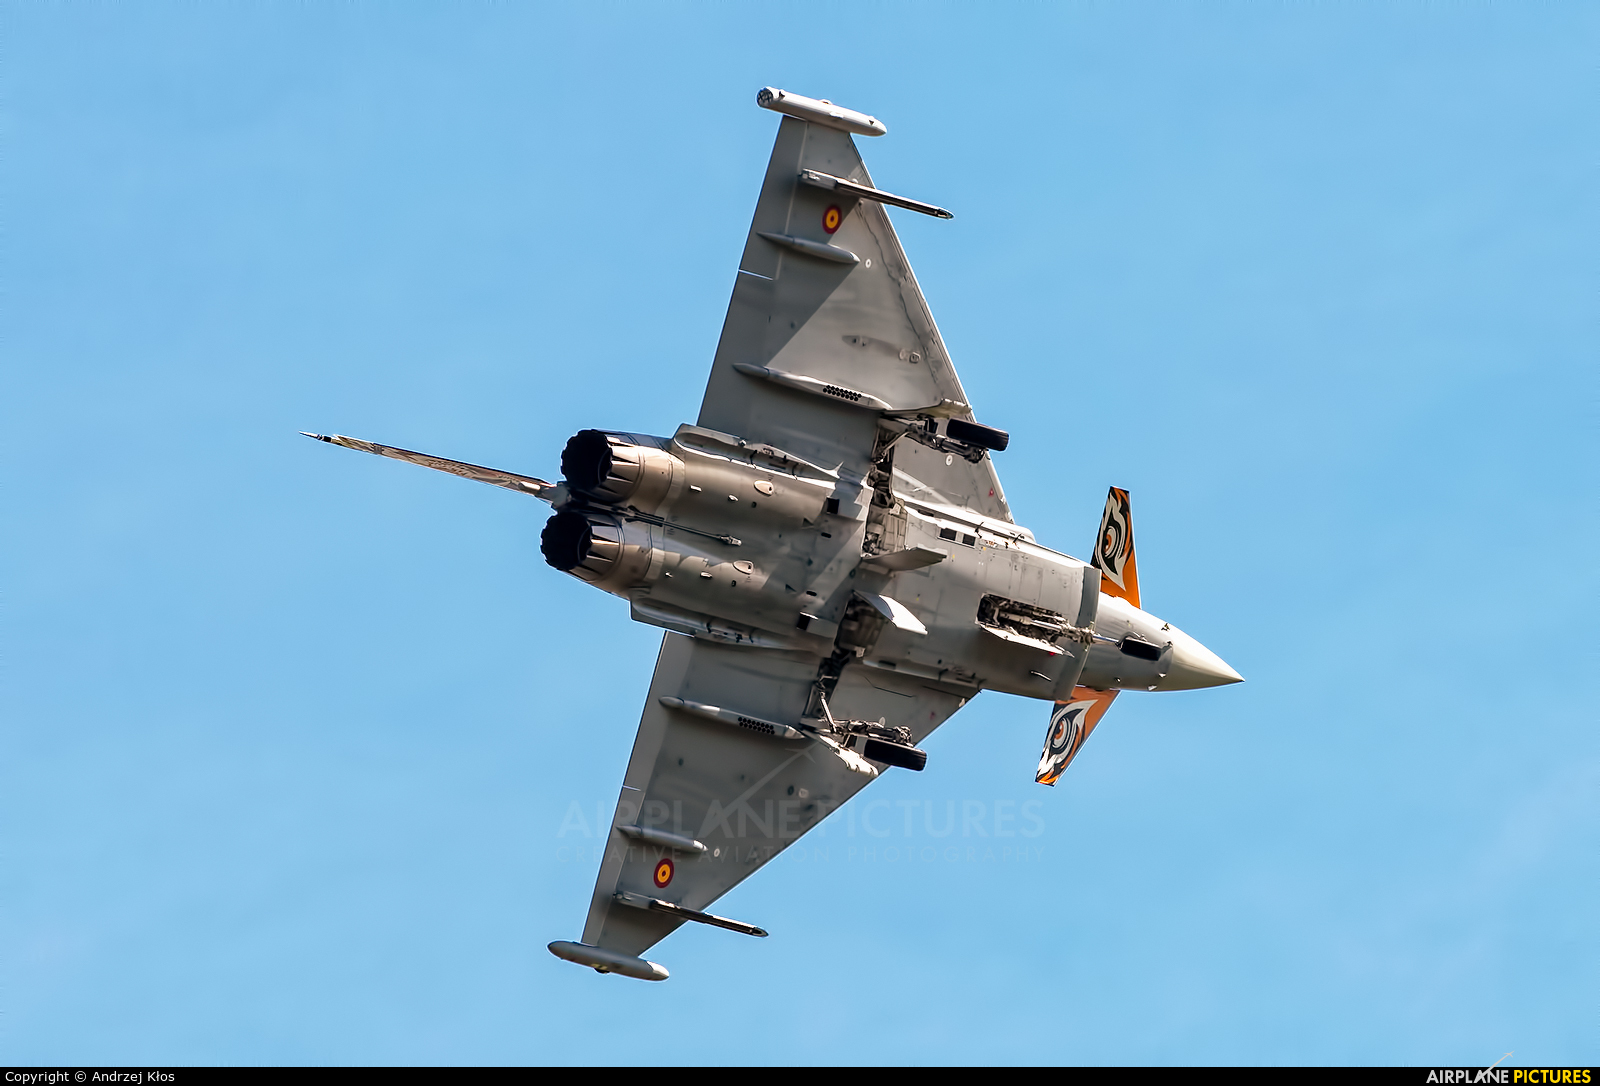 Spain - Air Force 14-31 aircraft at Ostrava Mošnov